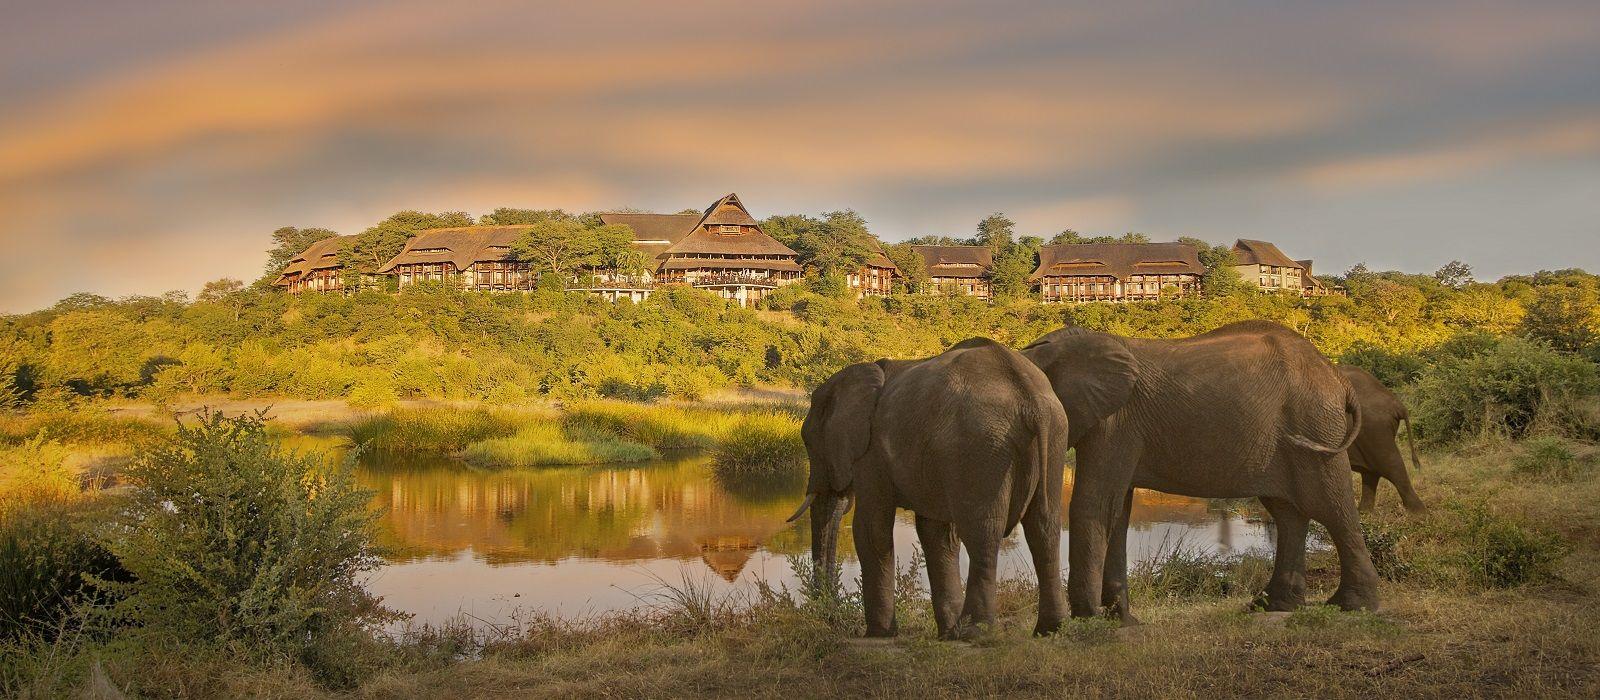 Enchanting Travels Zimbabwe Tours Victoria Falls Safari Lodge Elephants in front of Victoria Falls Safari Lodge